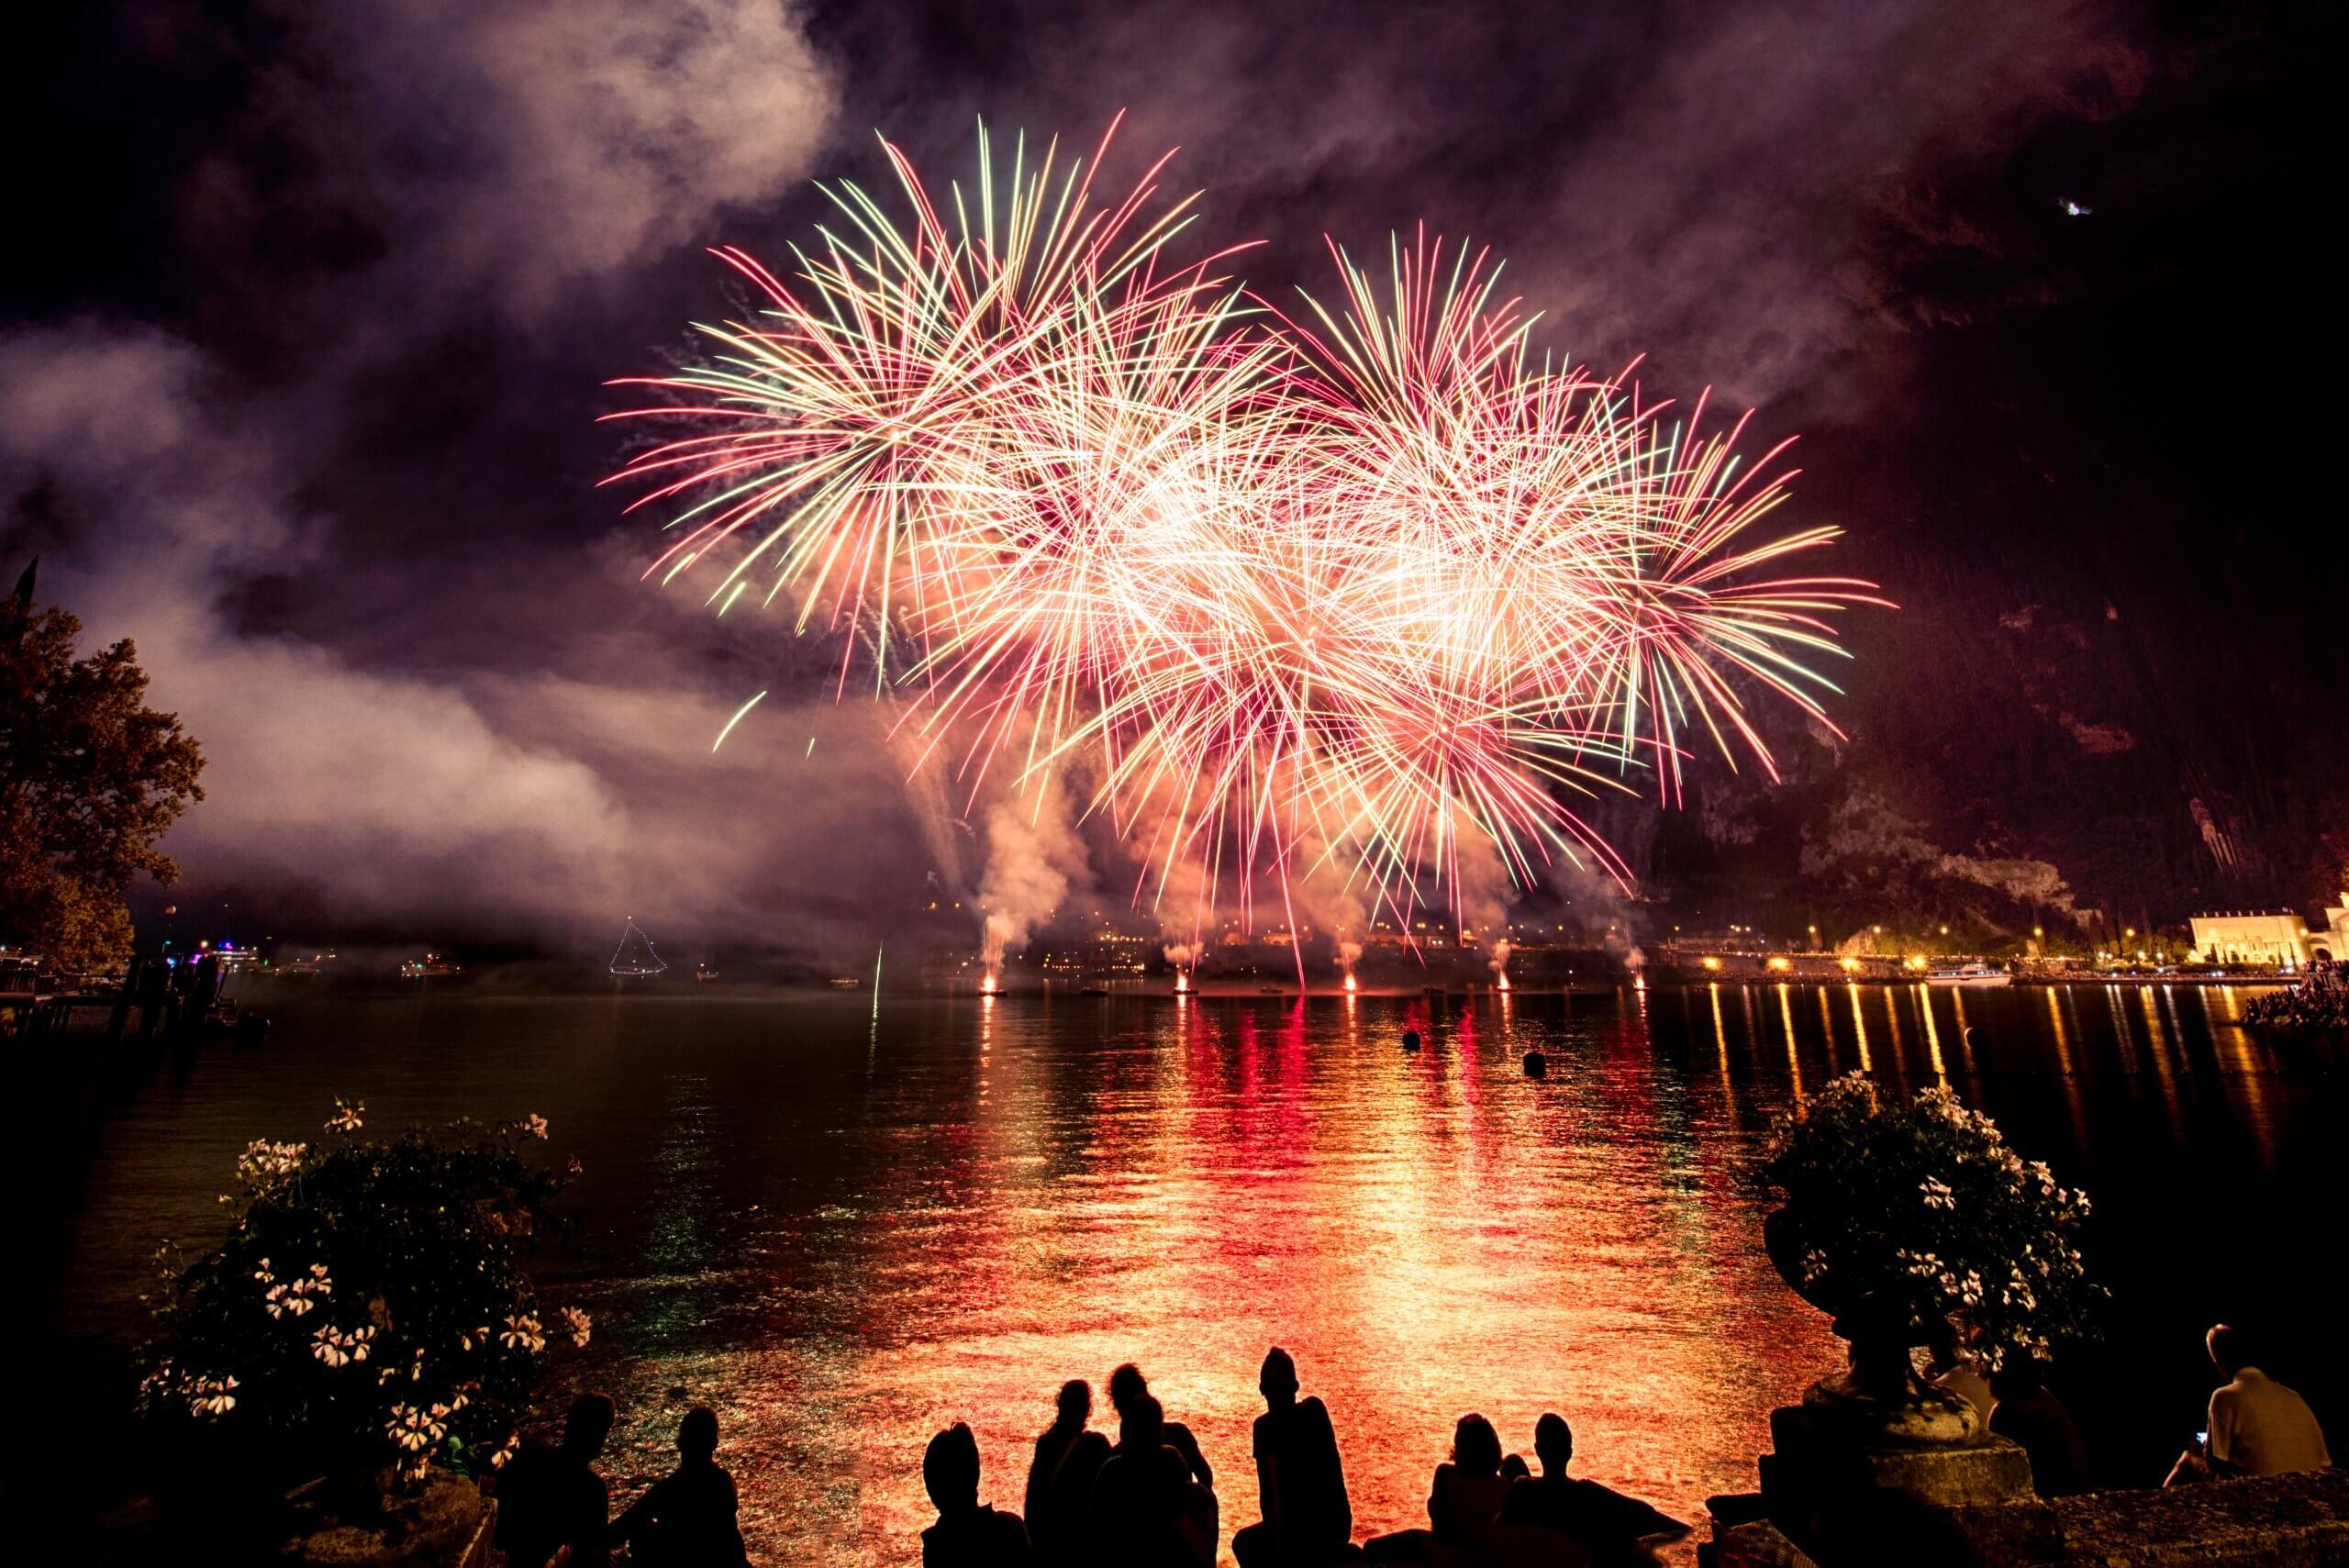 fireworks affect indoor air